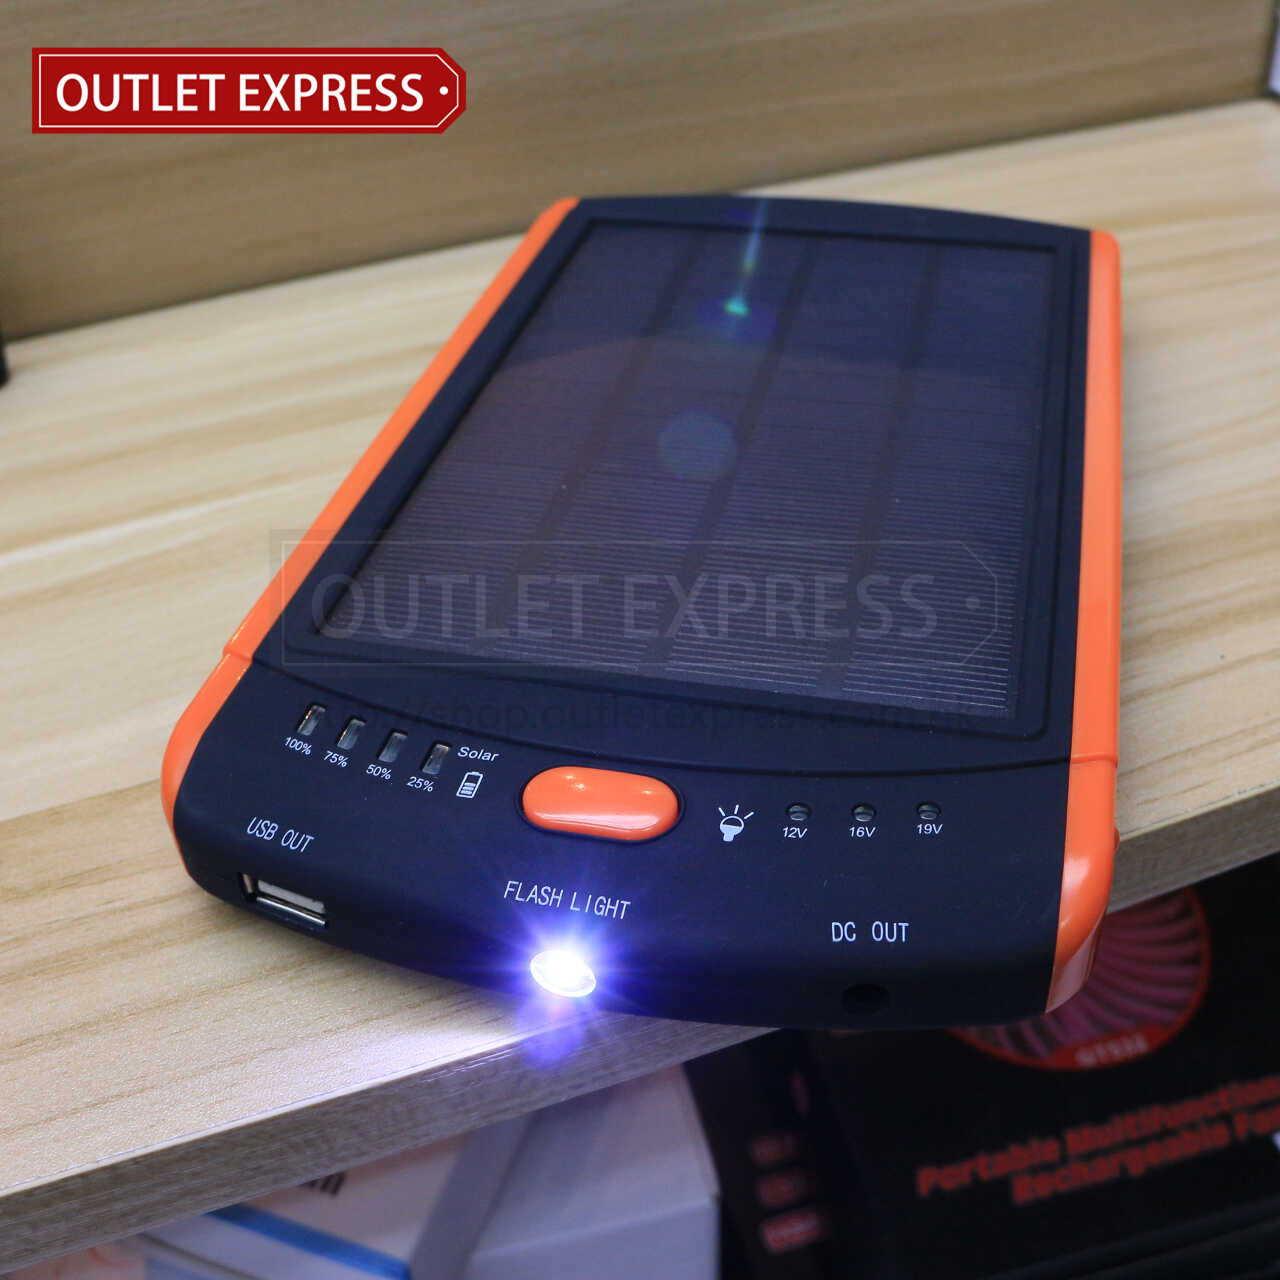 23000mAH 超薄太陽能移動電源 電筒功能- Outlet Express HK 生活百貨城實拍圖